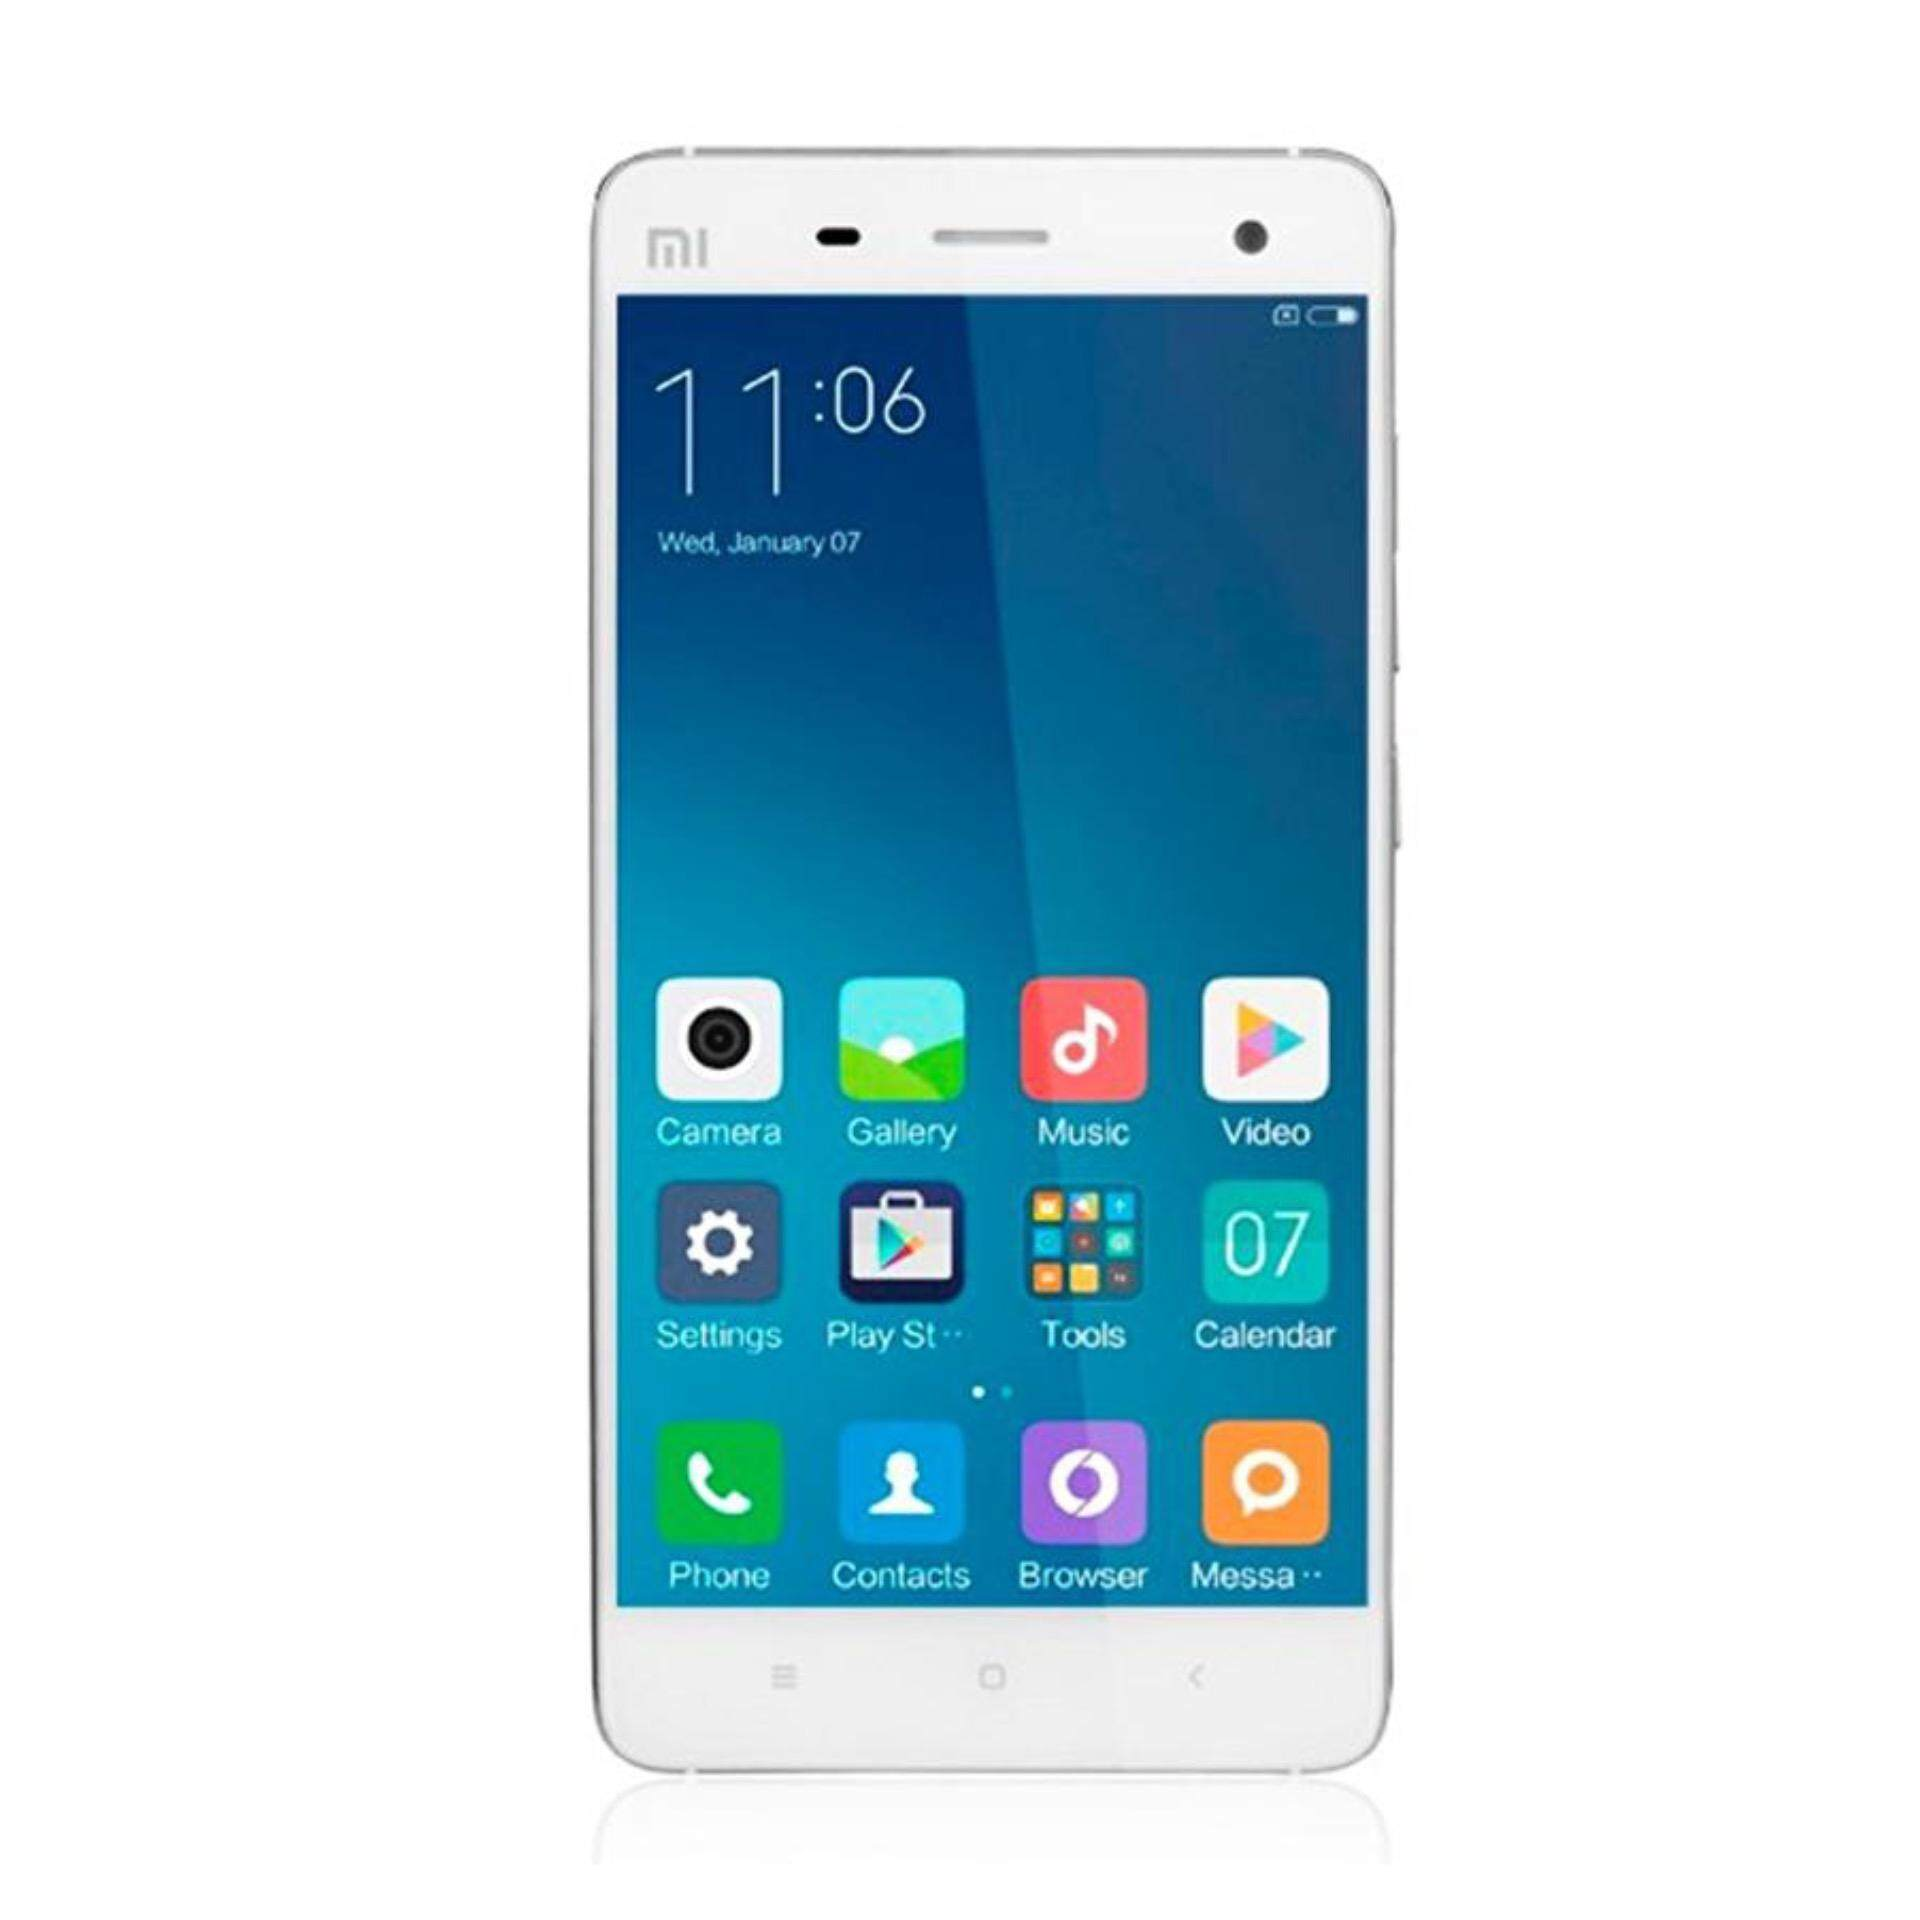 Xiaomi Mi Mi4 Price Online In Malaysia October 2018 Mybestprice 4c 3gb 32gb White Product